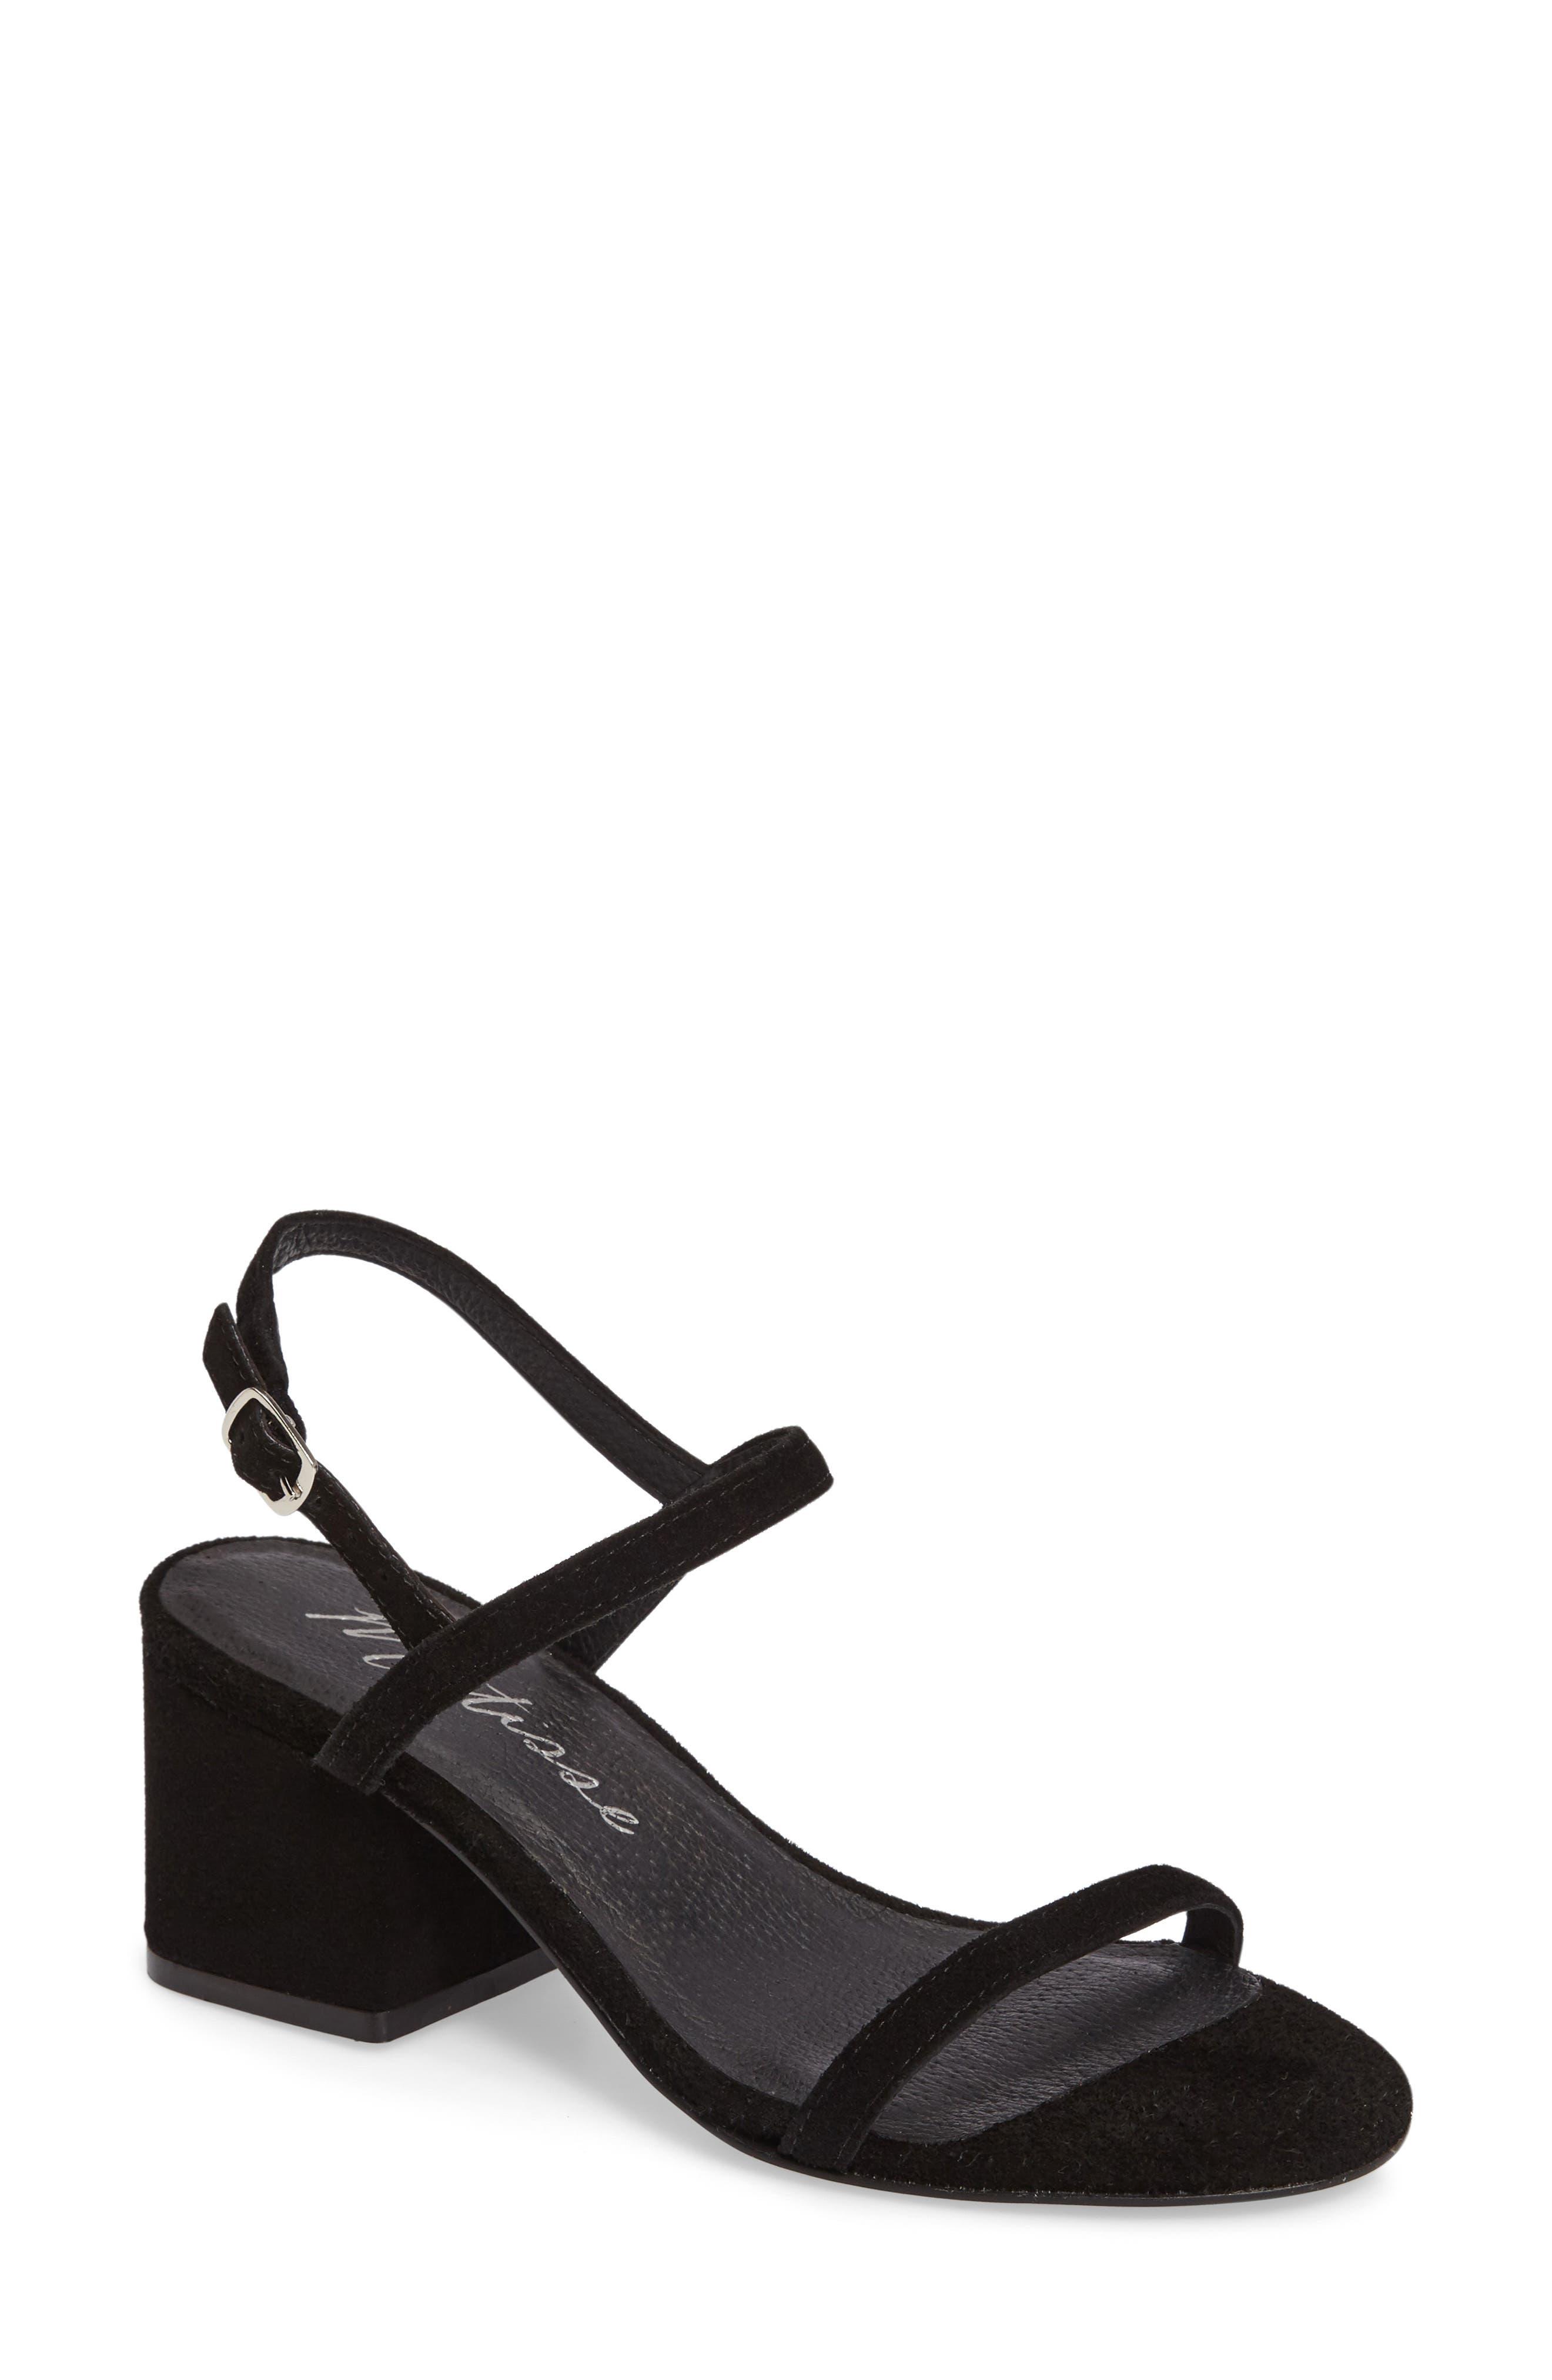 Alternate Image 1 Selected - Matisse Stella Block Heel Sandal (Women)